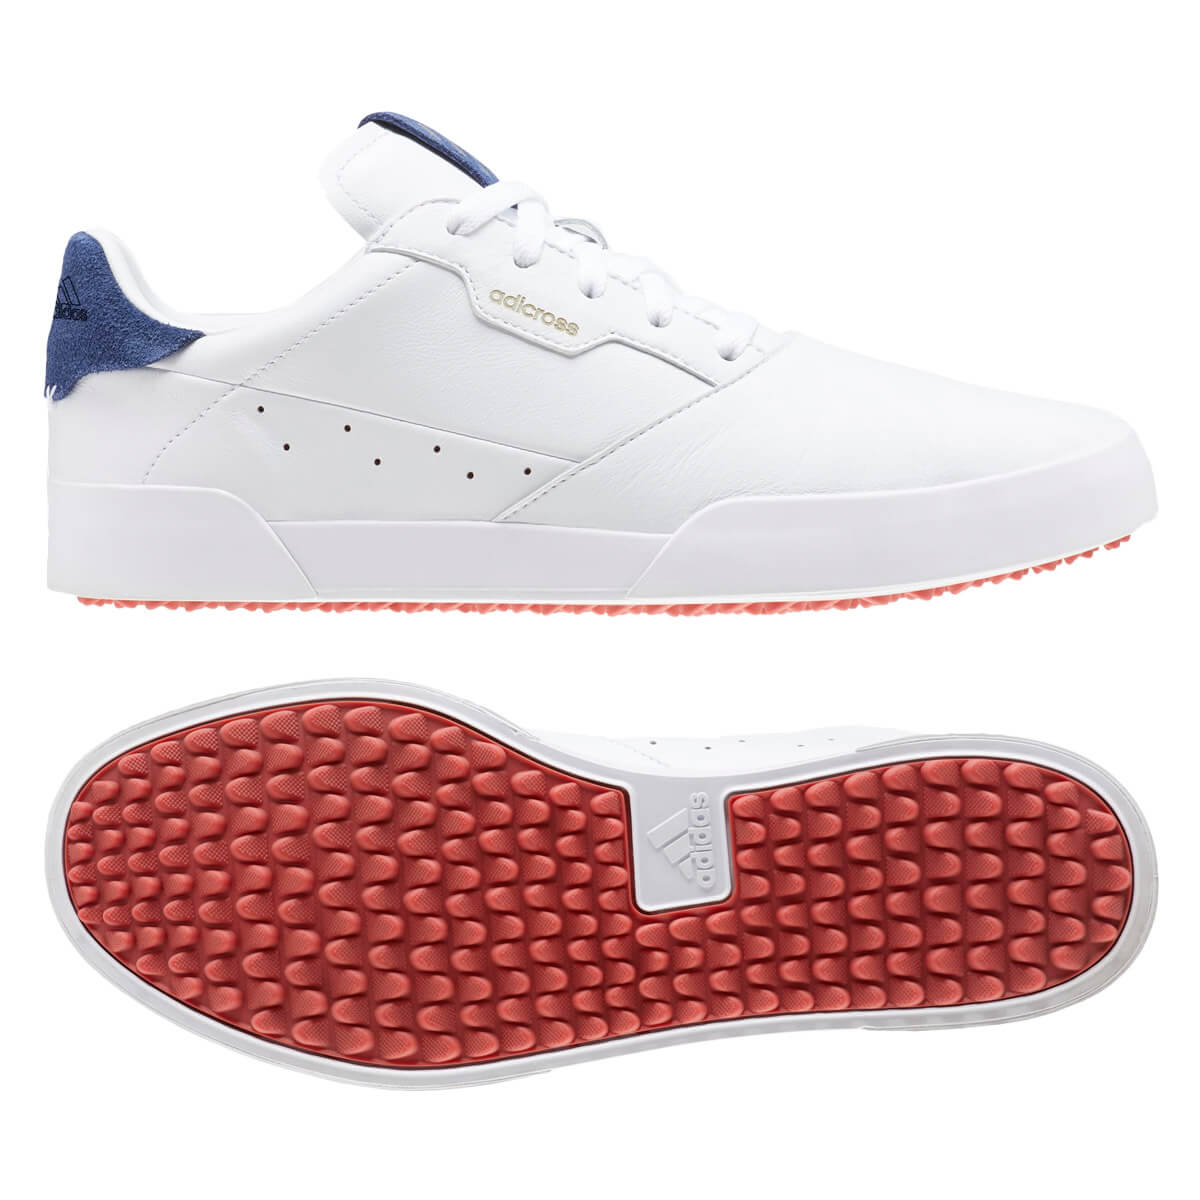 adidas Golf Mens 2021 Adicross Retro Spikeless Waterproof Leather ...